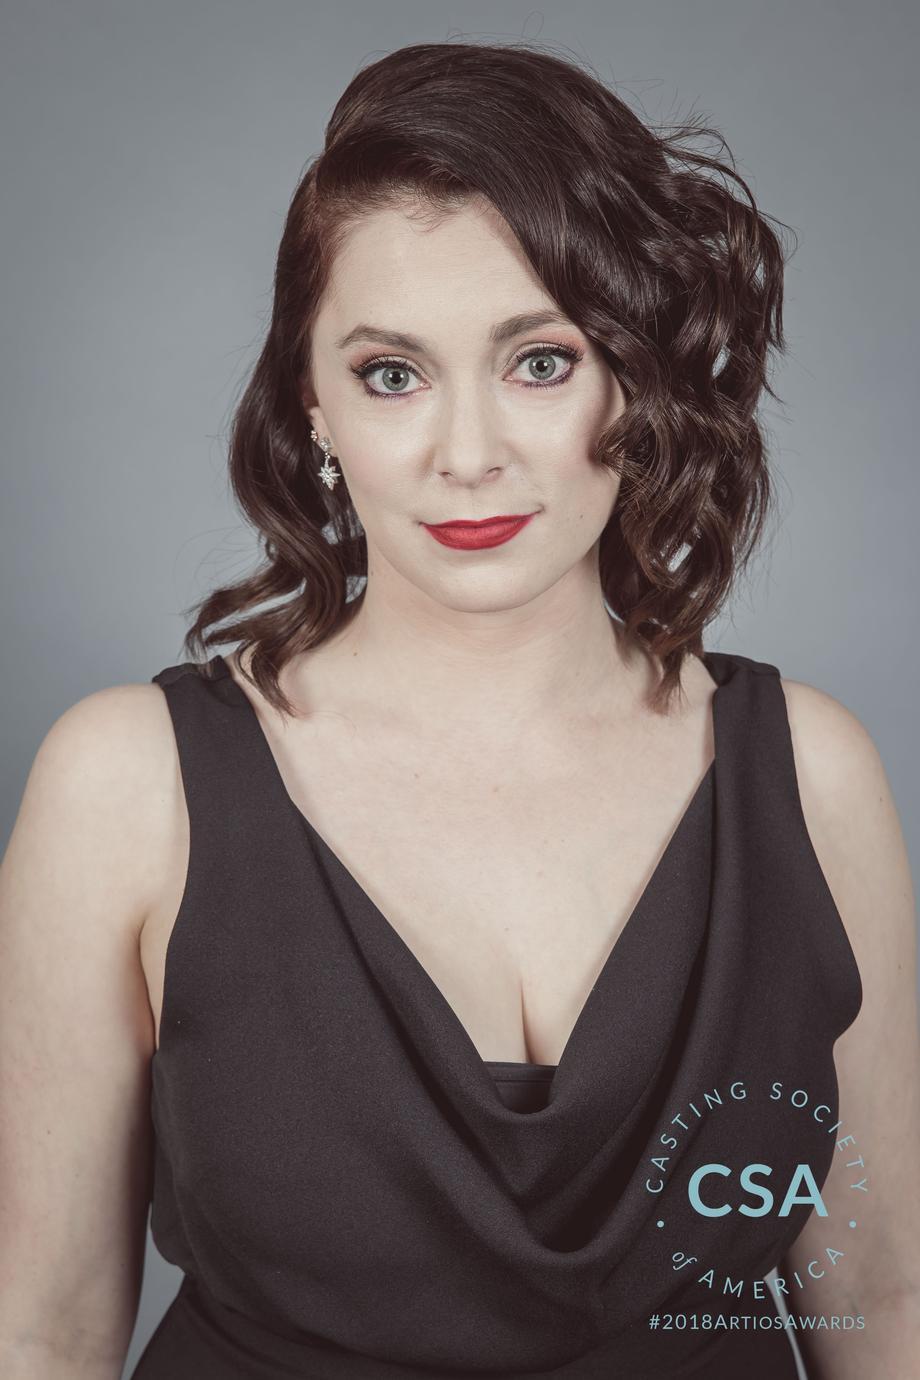 Presenter Rachel Bloom: photo credit: Lisa Kelly Remerowski